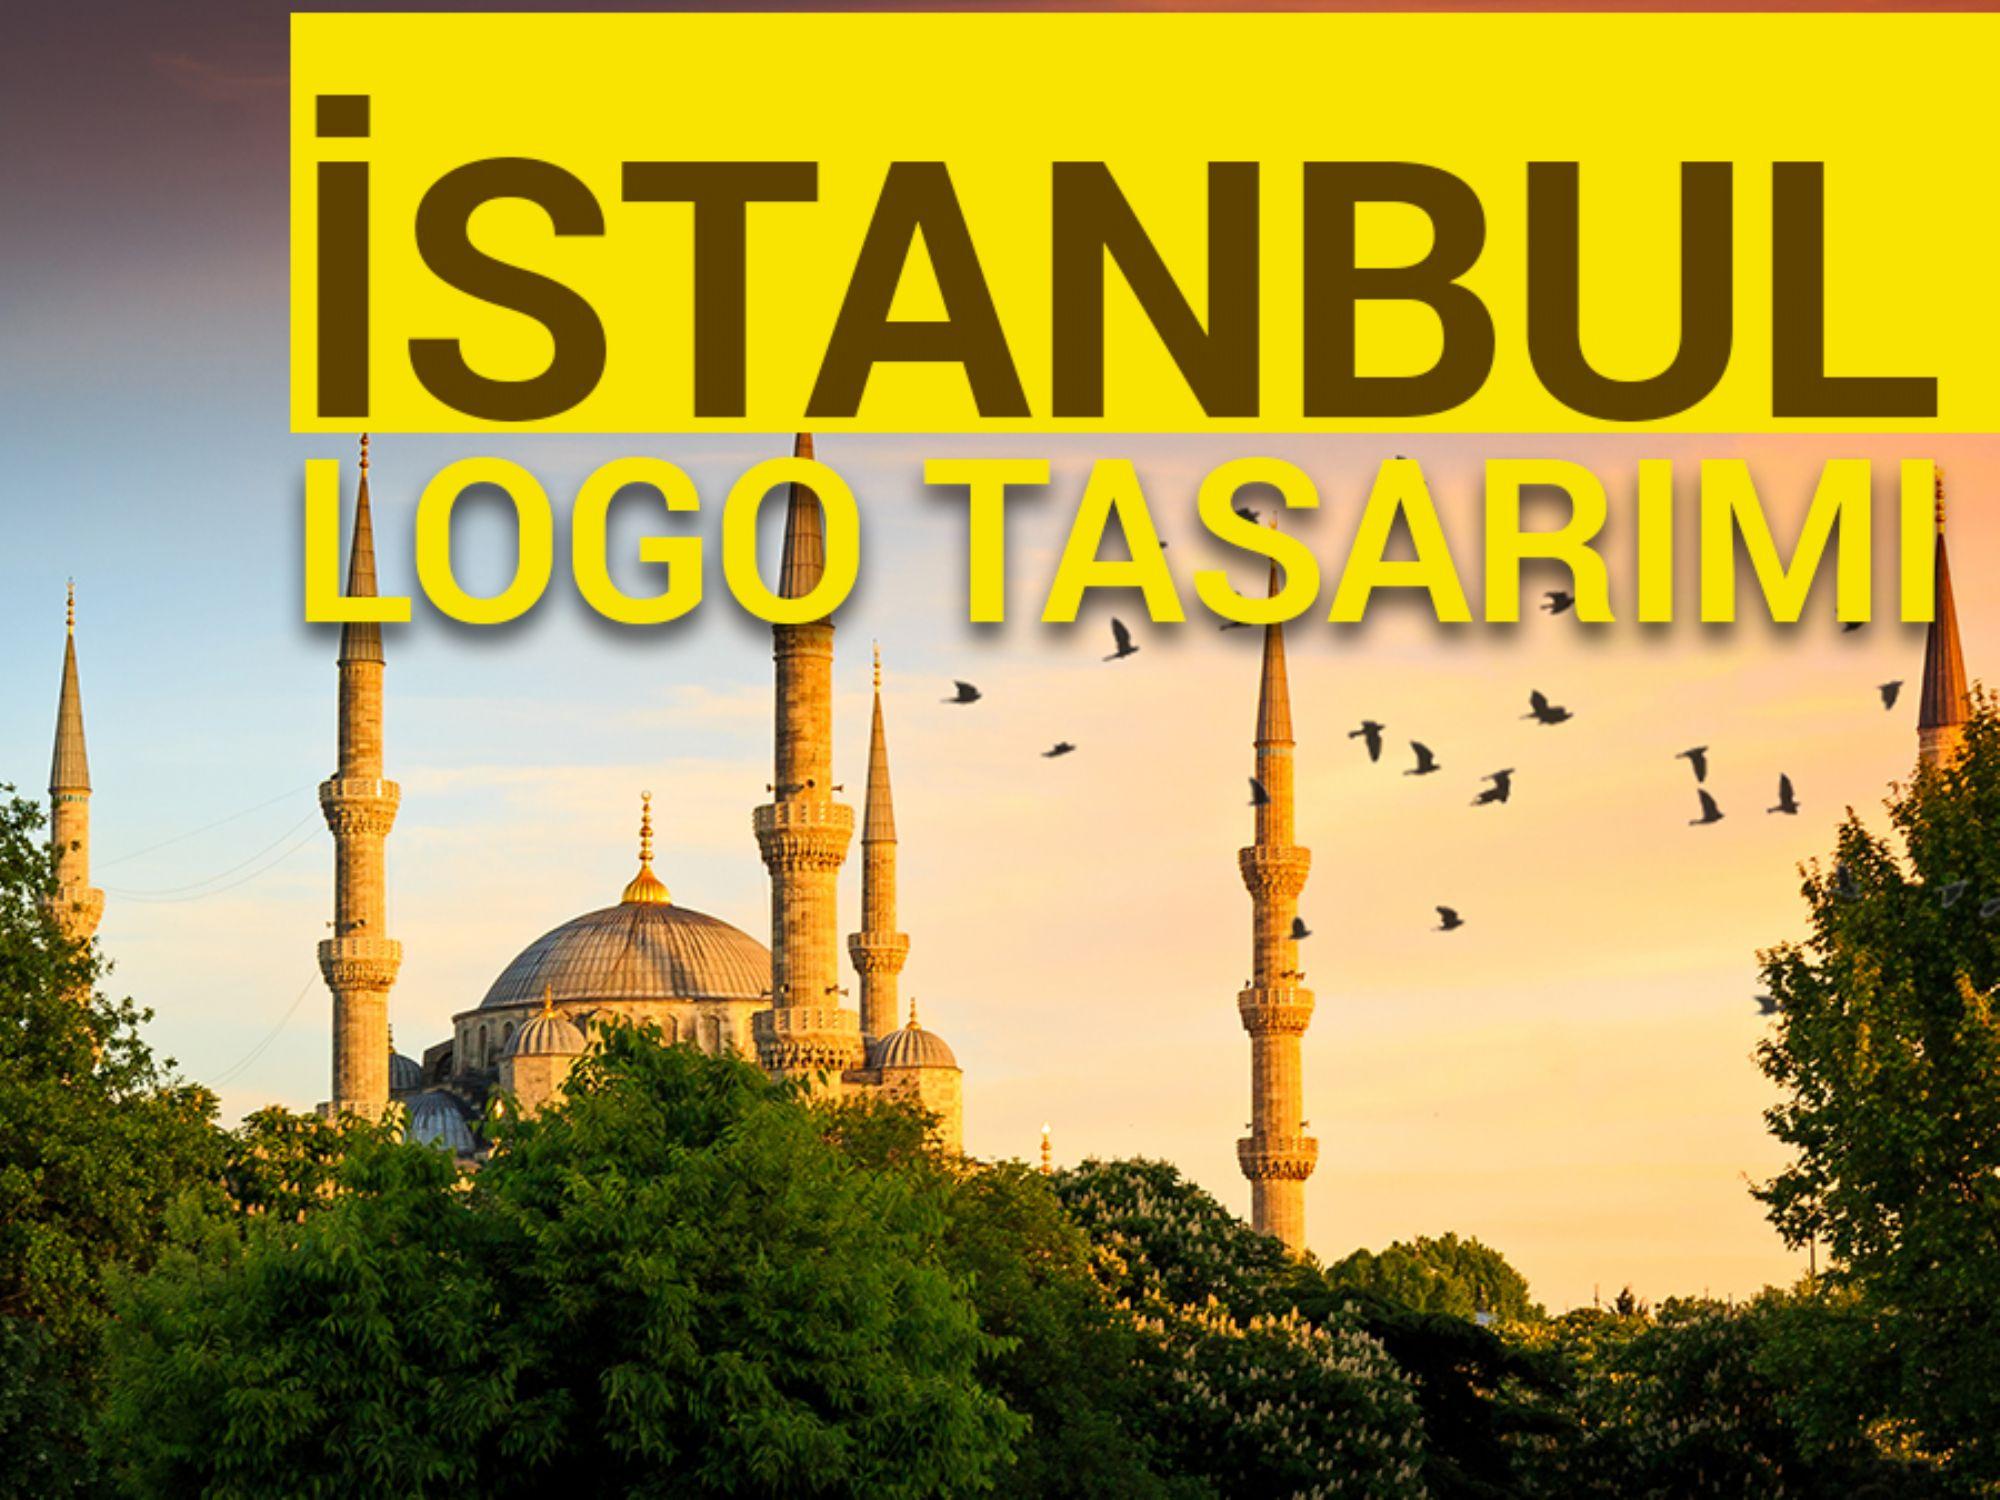 İstanbul Logo Tasarımı - İstanbul Logo Tasarım